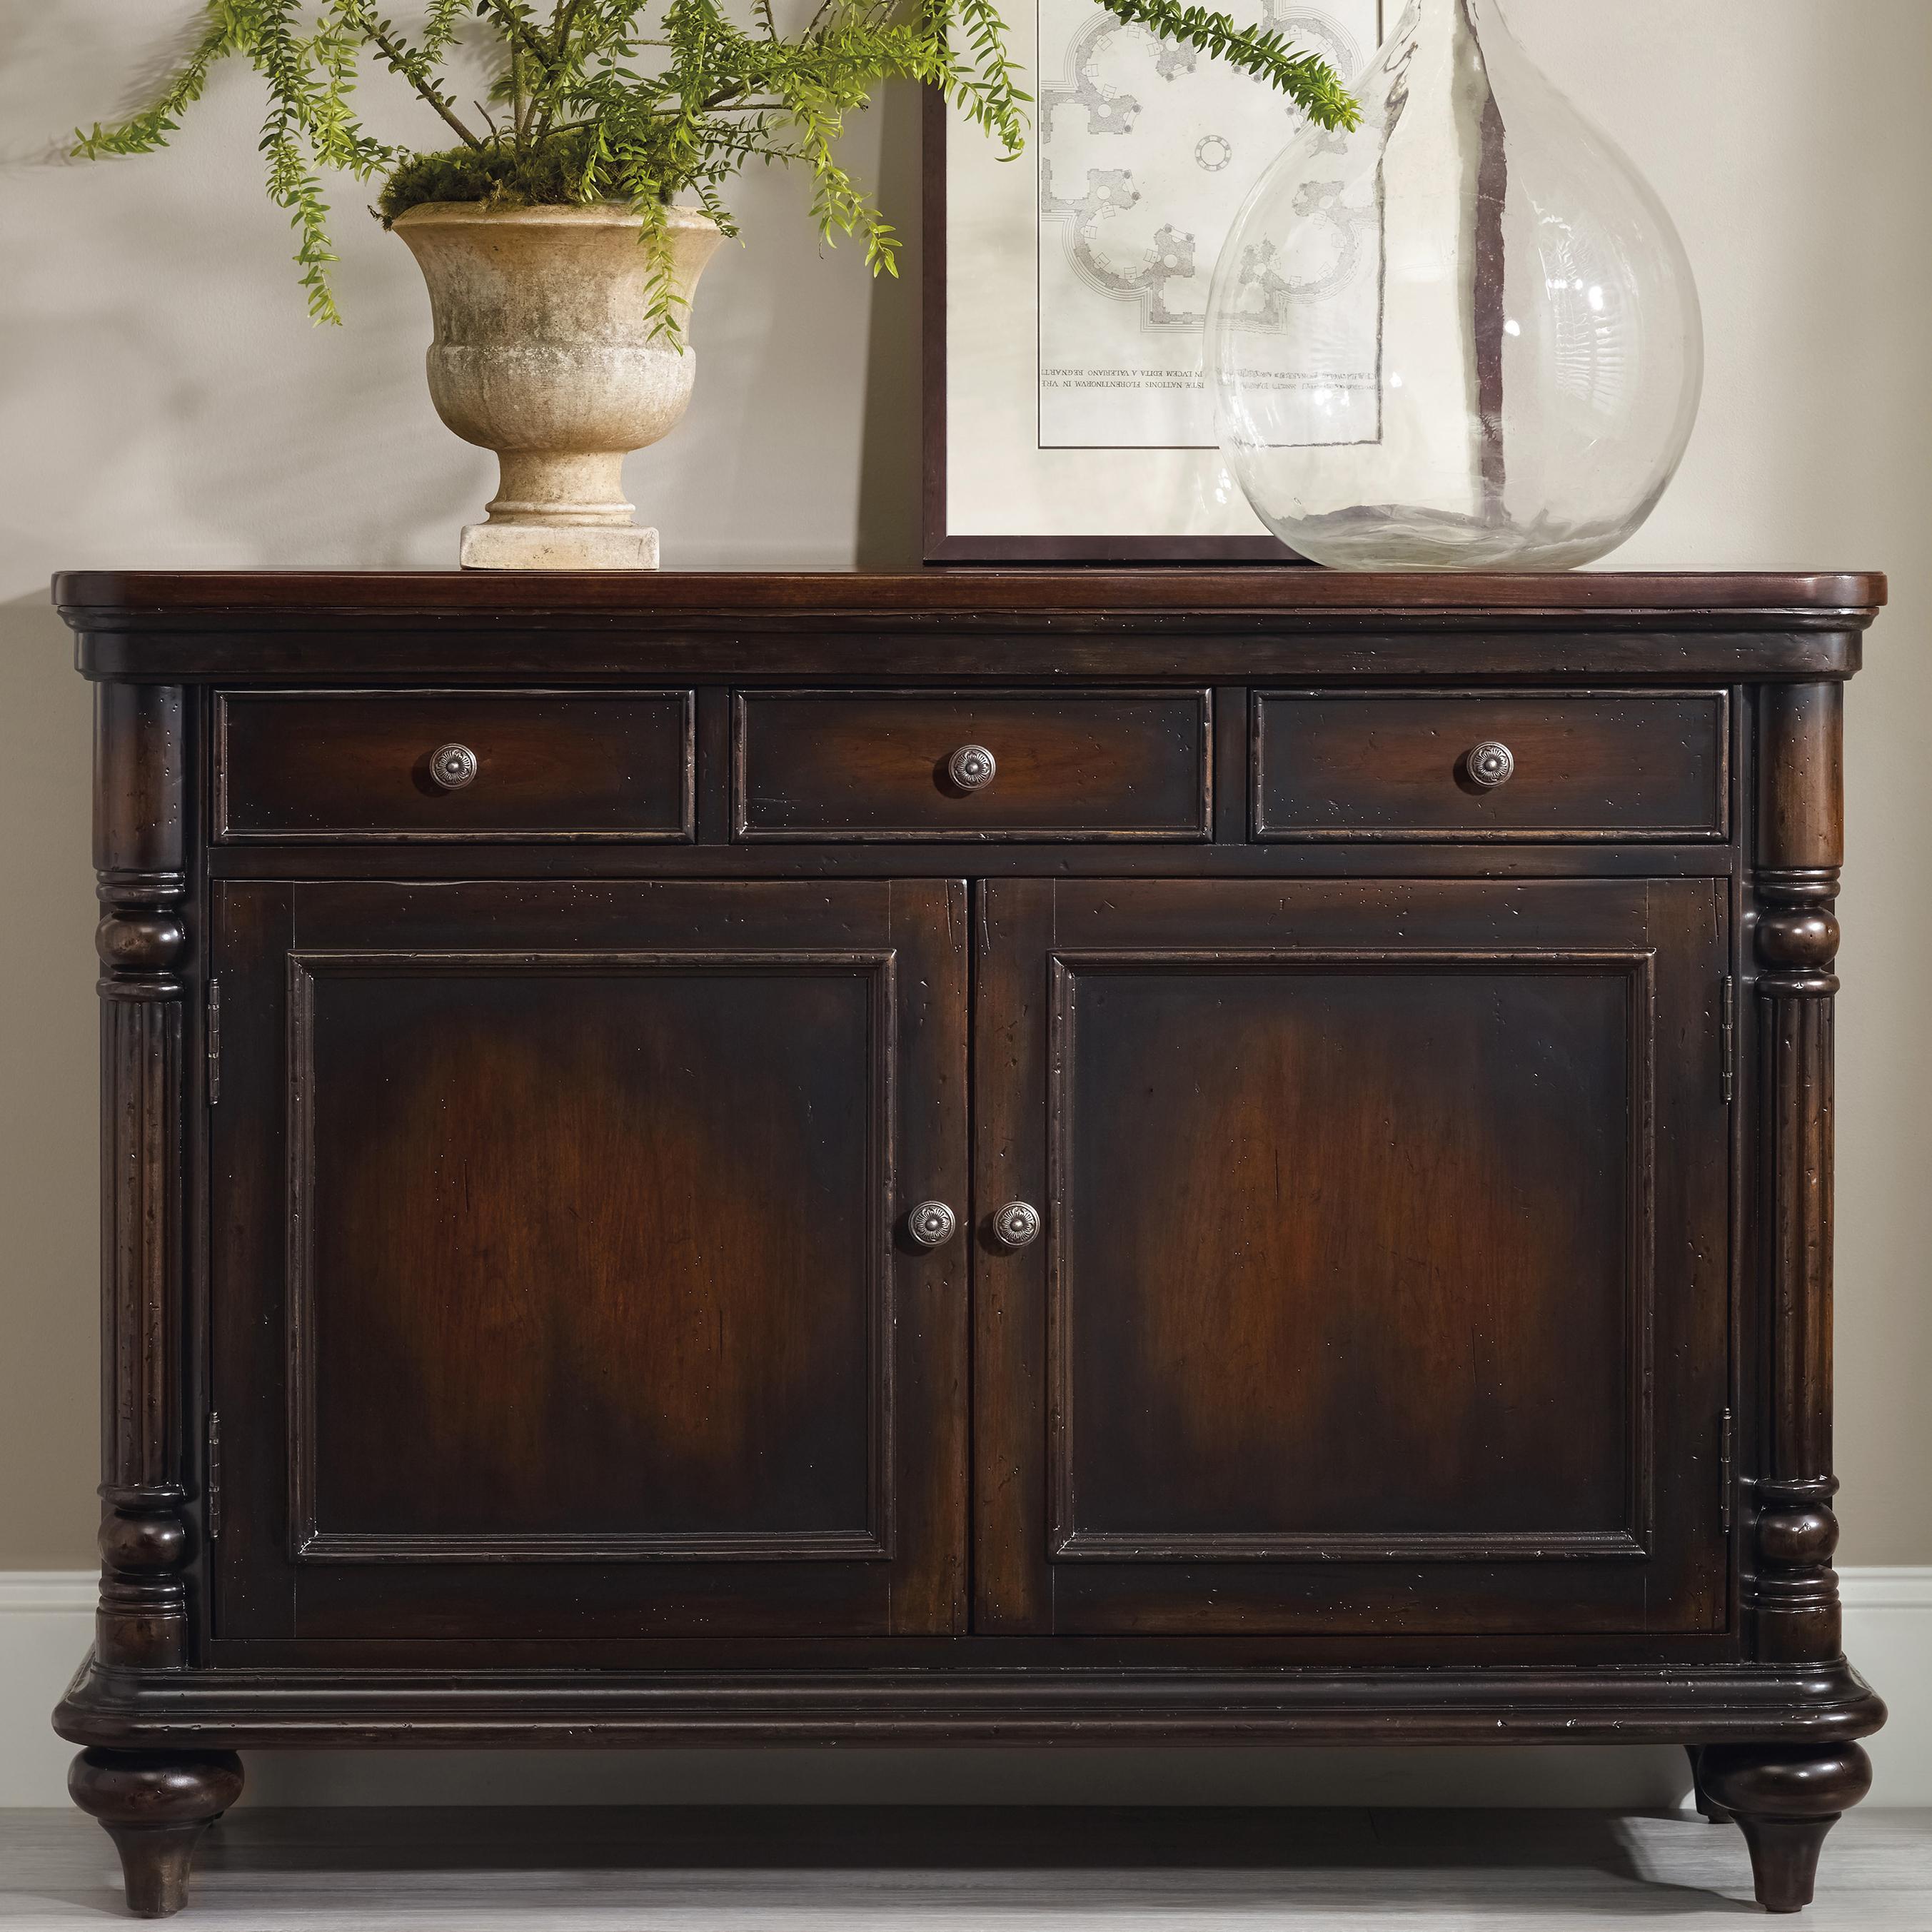 Hooker Furniture Eastridge Buffet - Item Number: 5177-75902